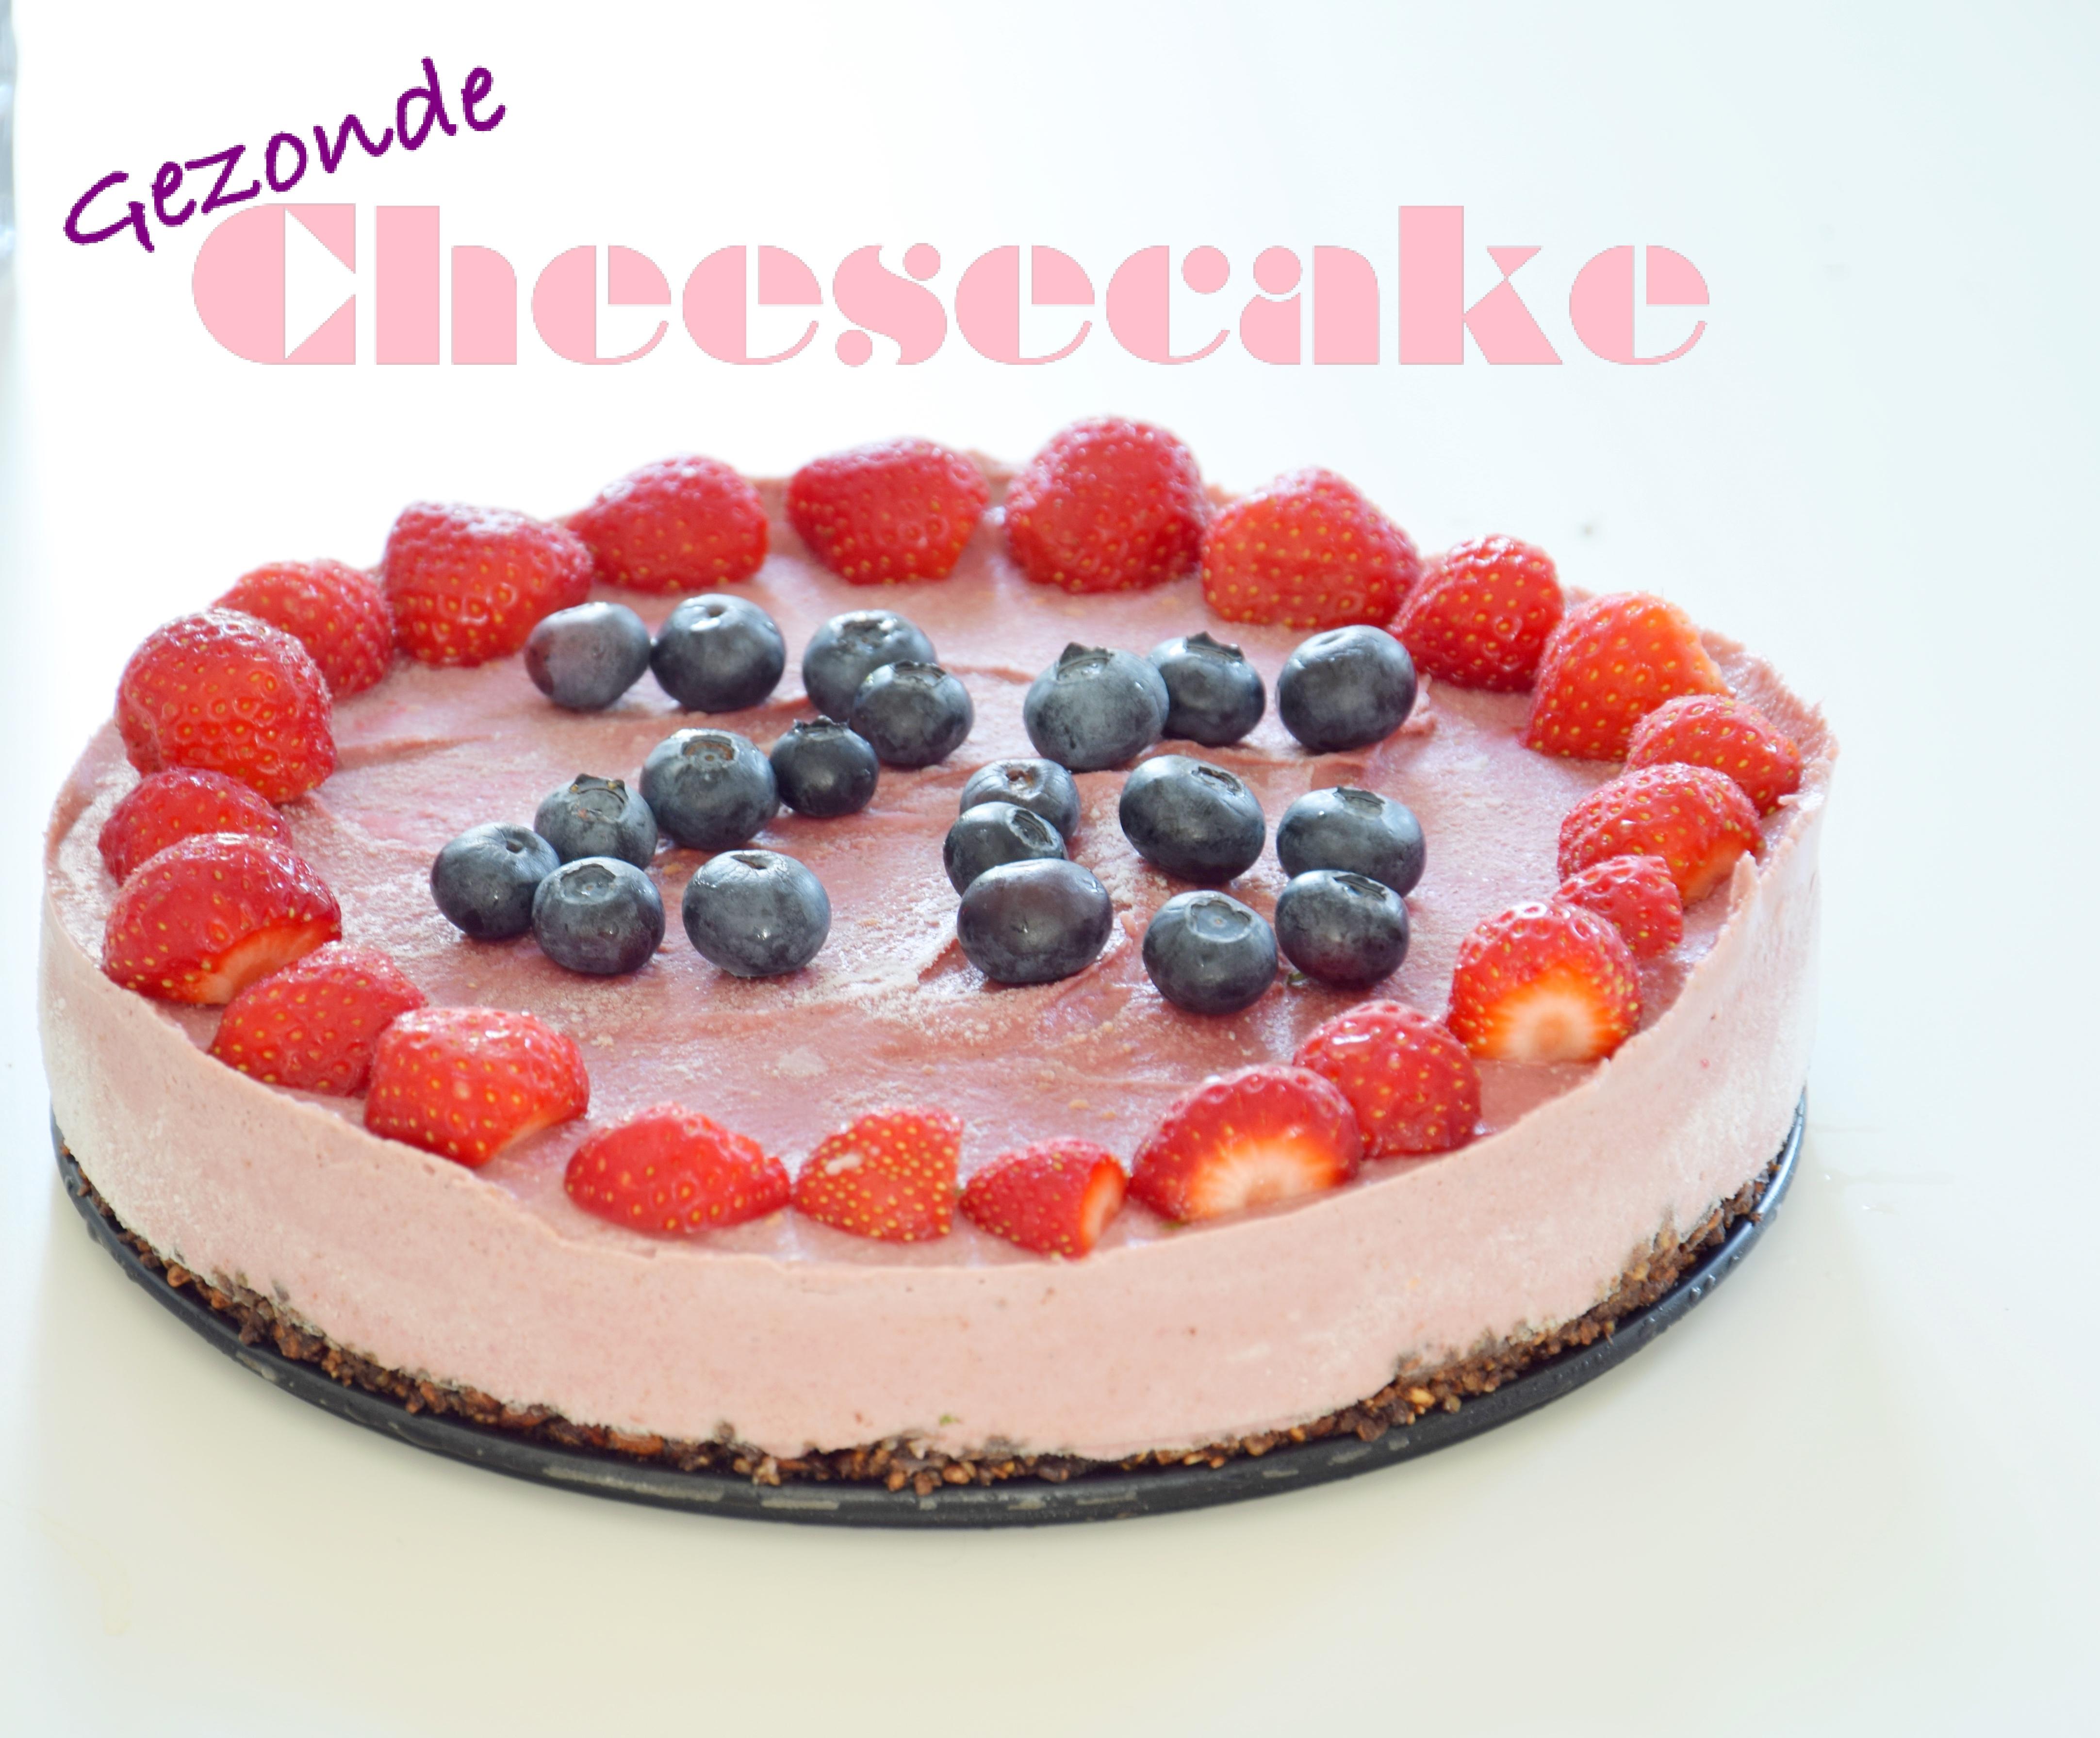 Gezonde cheesecake met aardbei en framboos